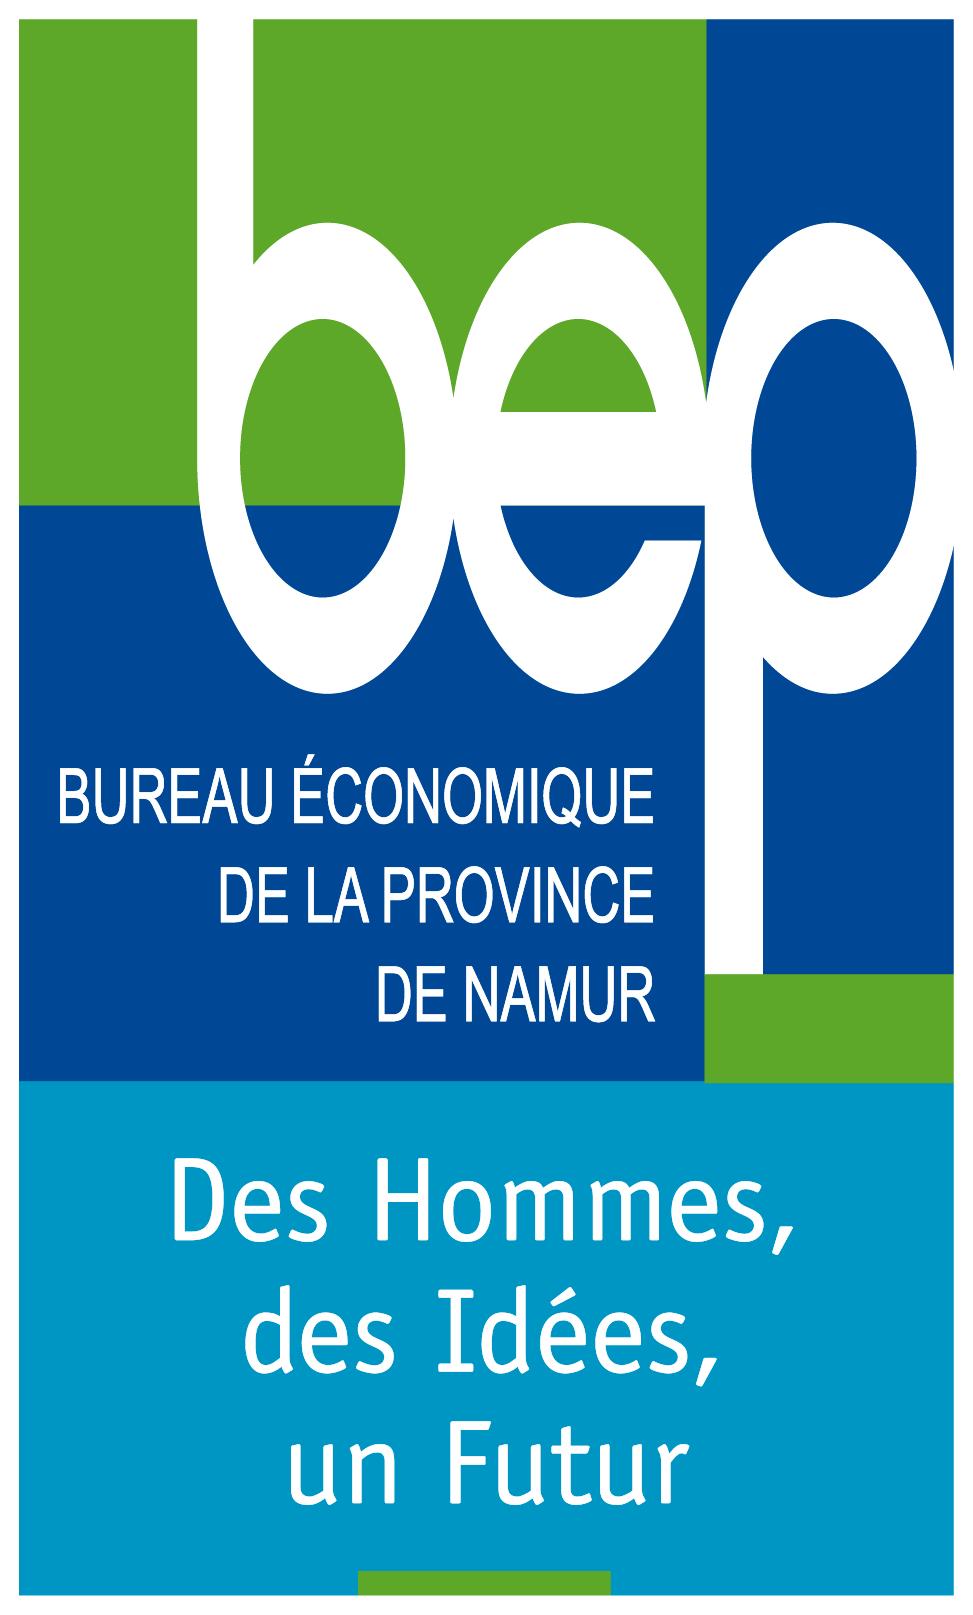 Wallonie Développement - Logo BEP